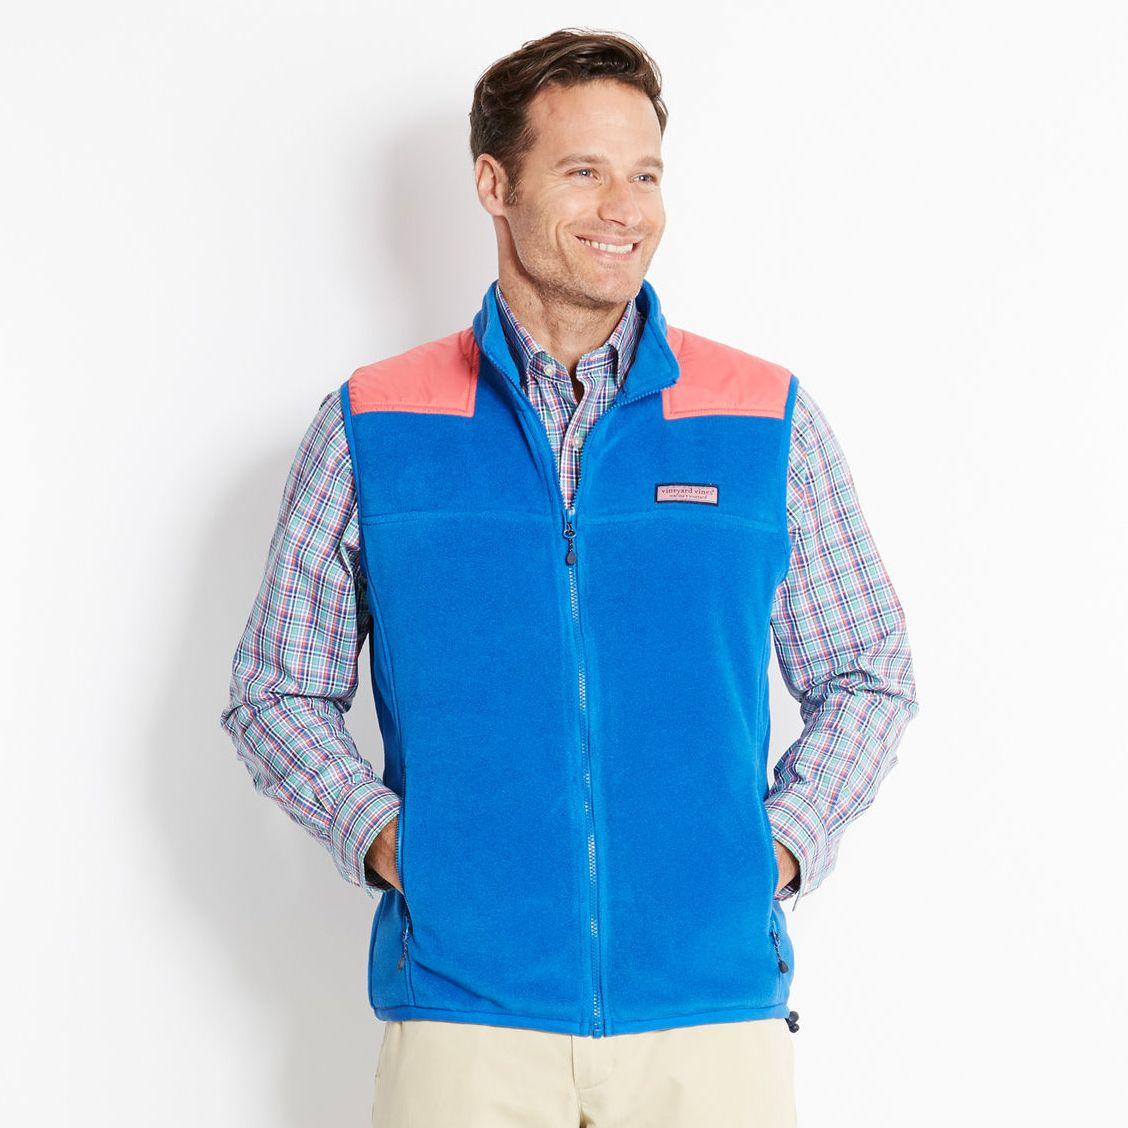 Vineyard vines fleece shep shirt vest menus jackets fall